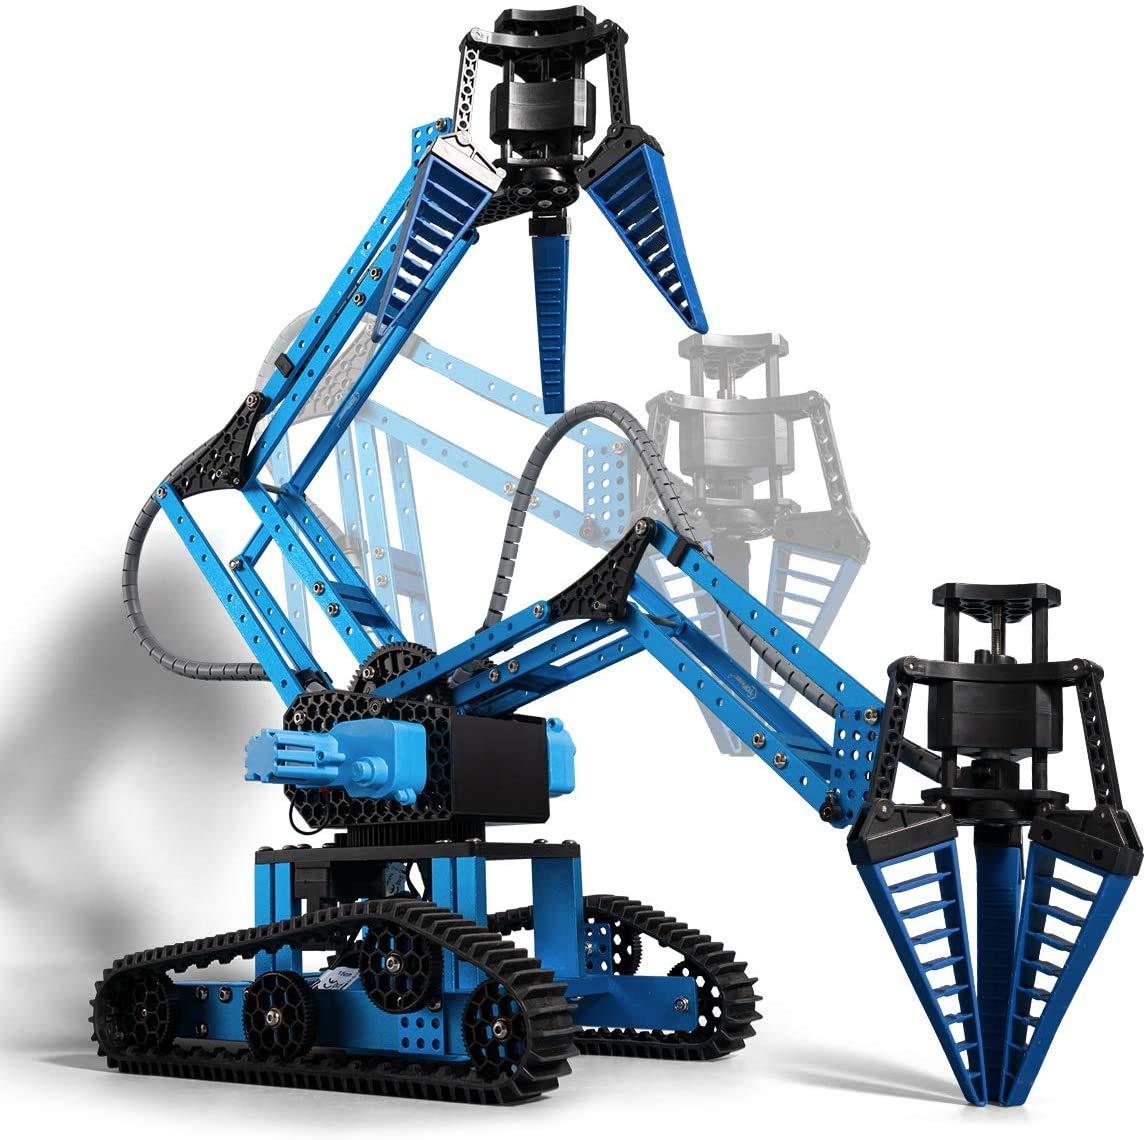 Top Race Remote Control RC Robot Arm, Alloy Metal Mechanical Robotic Arm Building Kit, DIY Take Apart Stem Excavator Robot